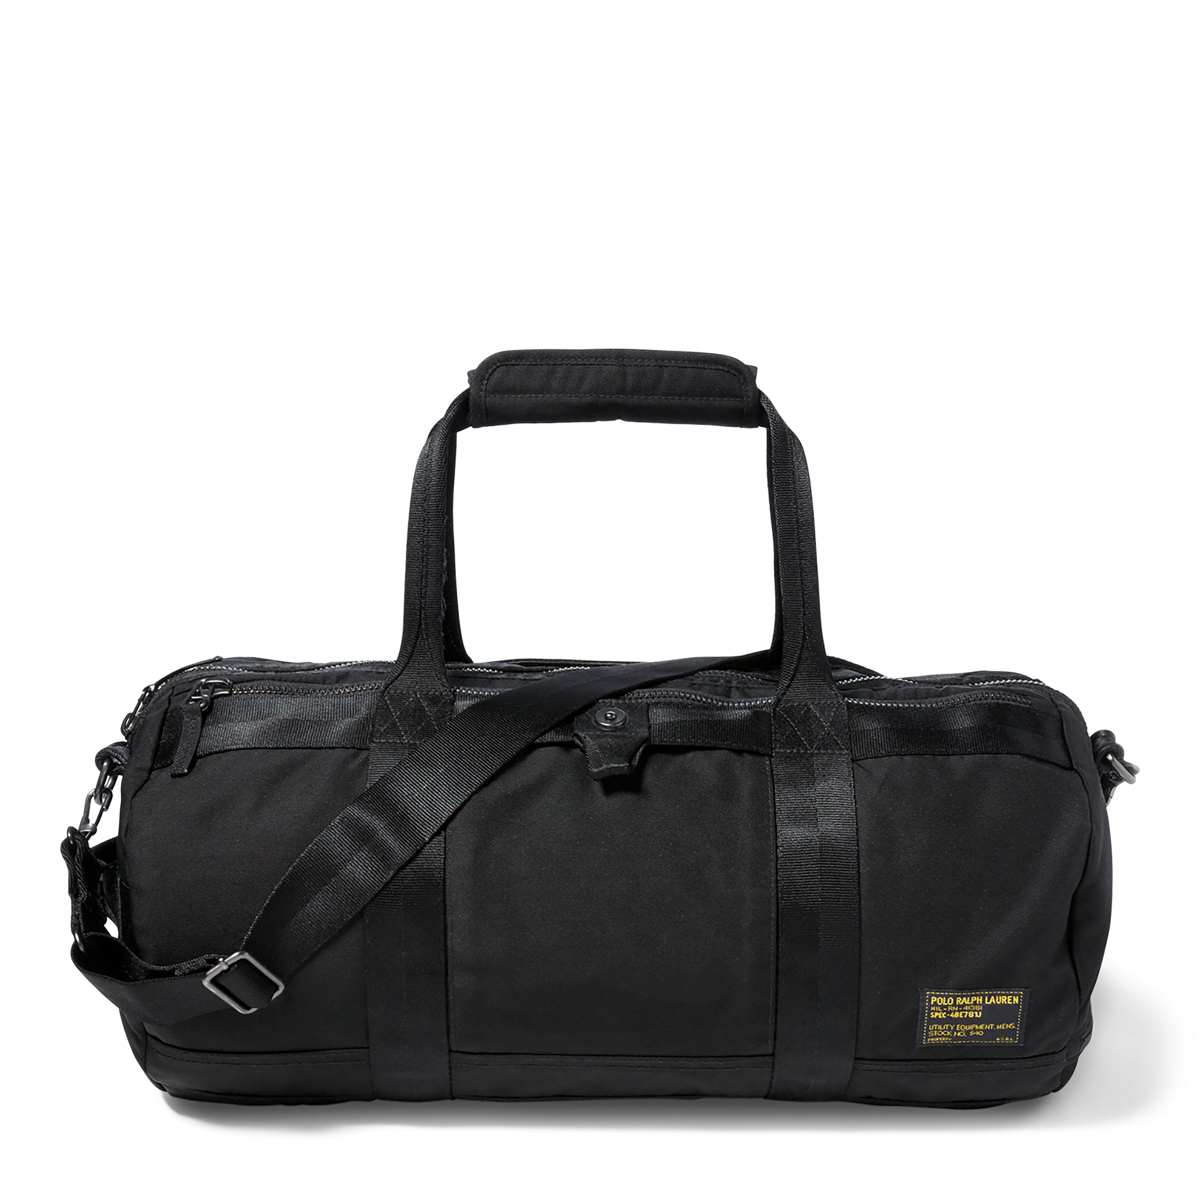 96f67eda2e8d Military Nylon Duffel Bag